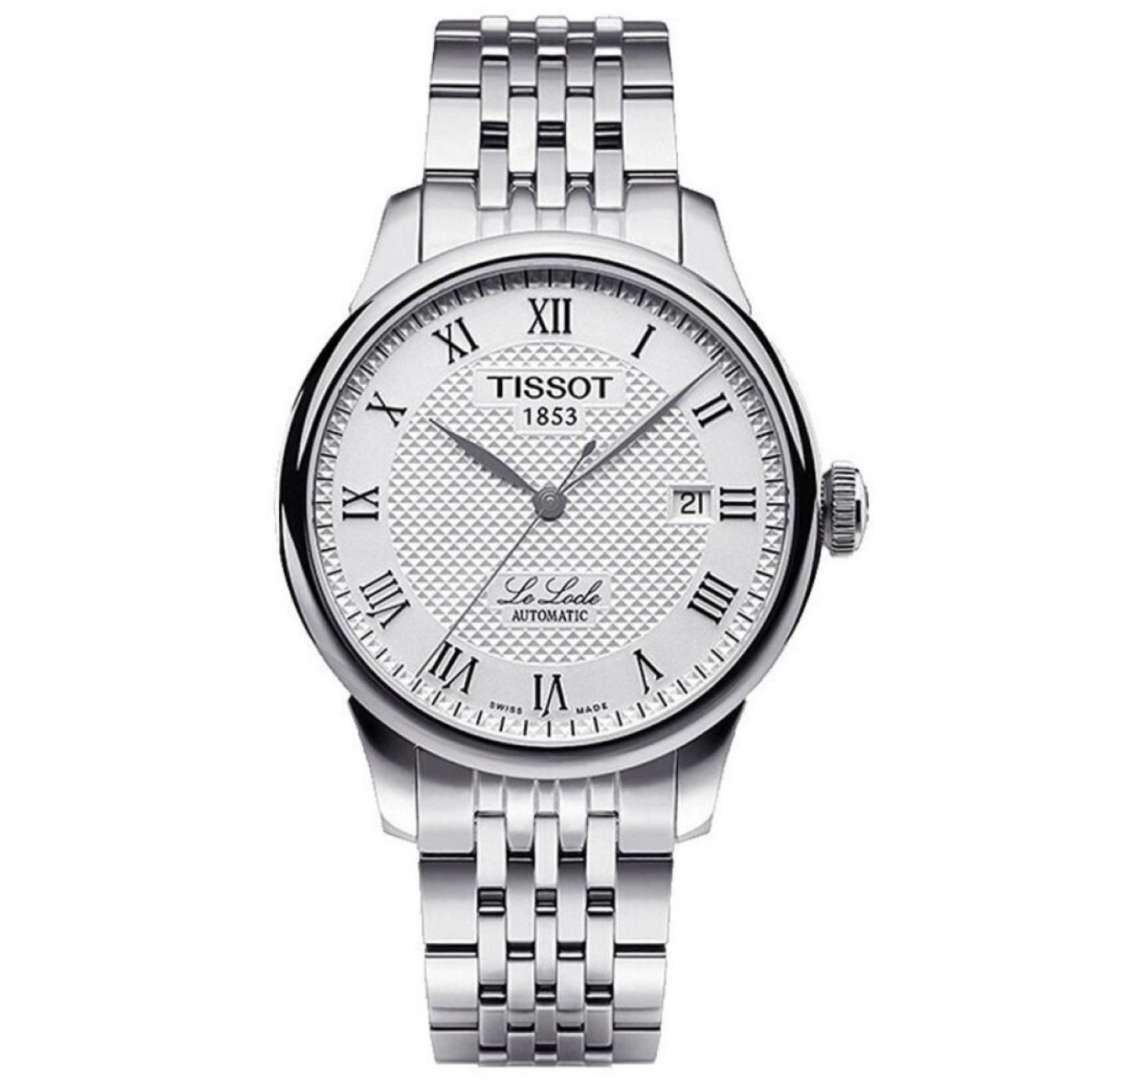 שעון יד אנלוגי tissot t41.1.483.33 טיסו